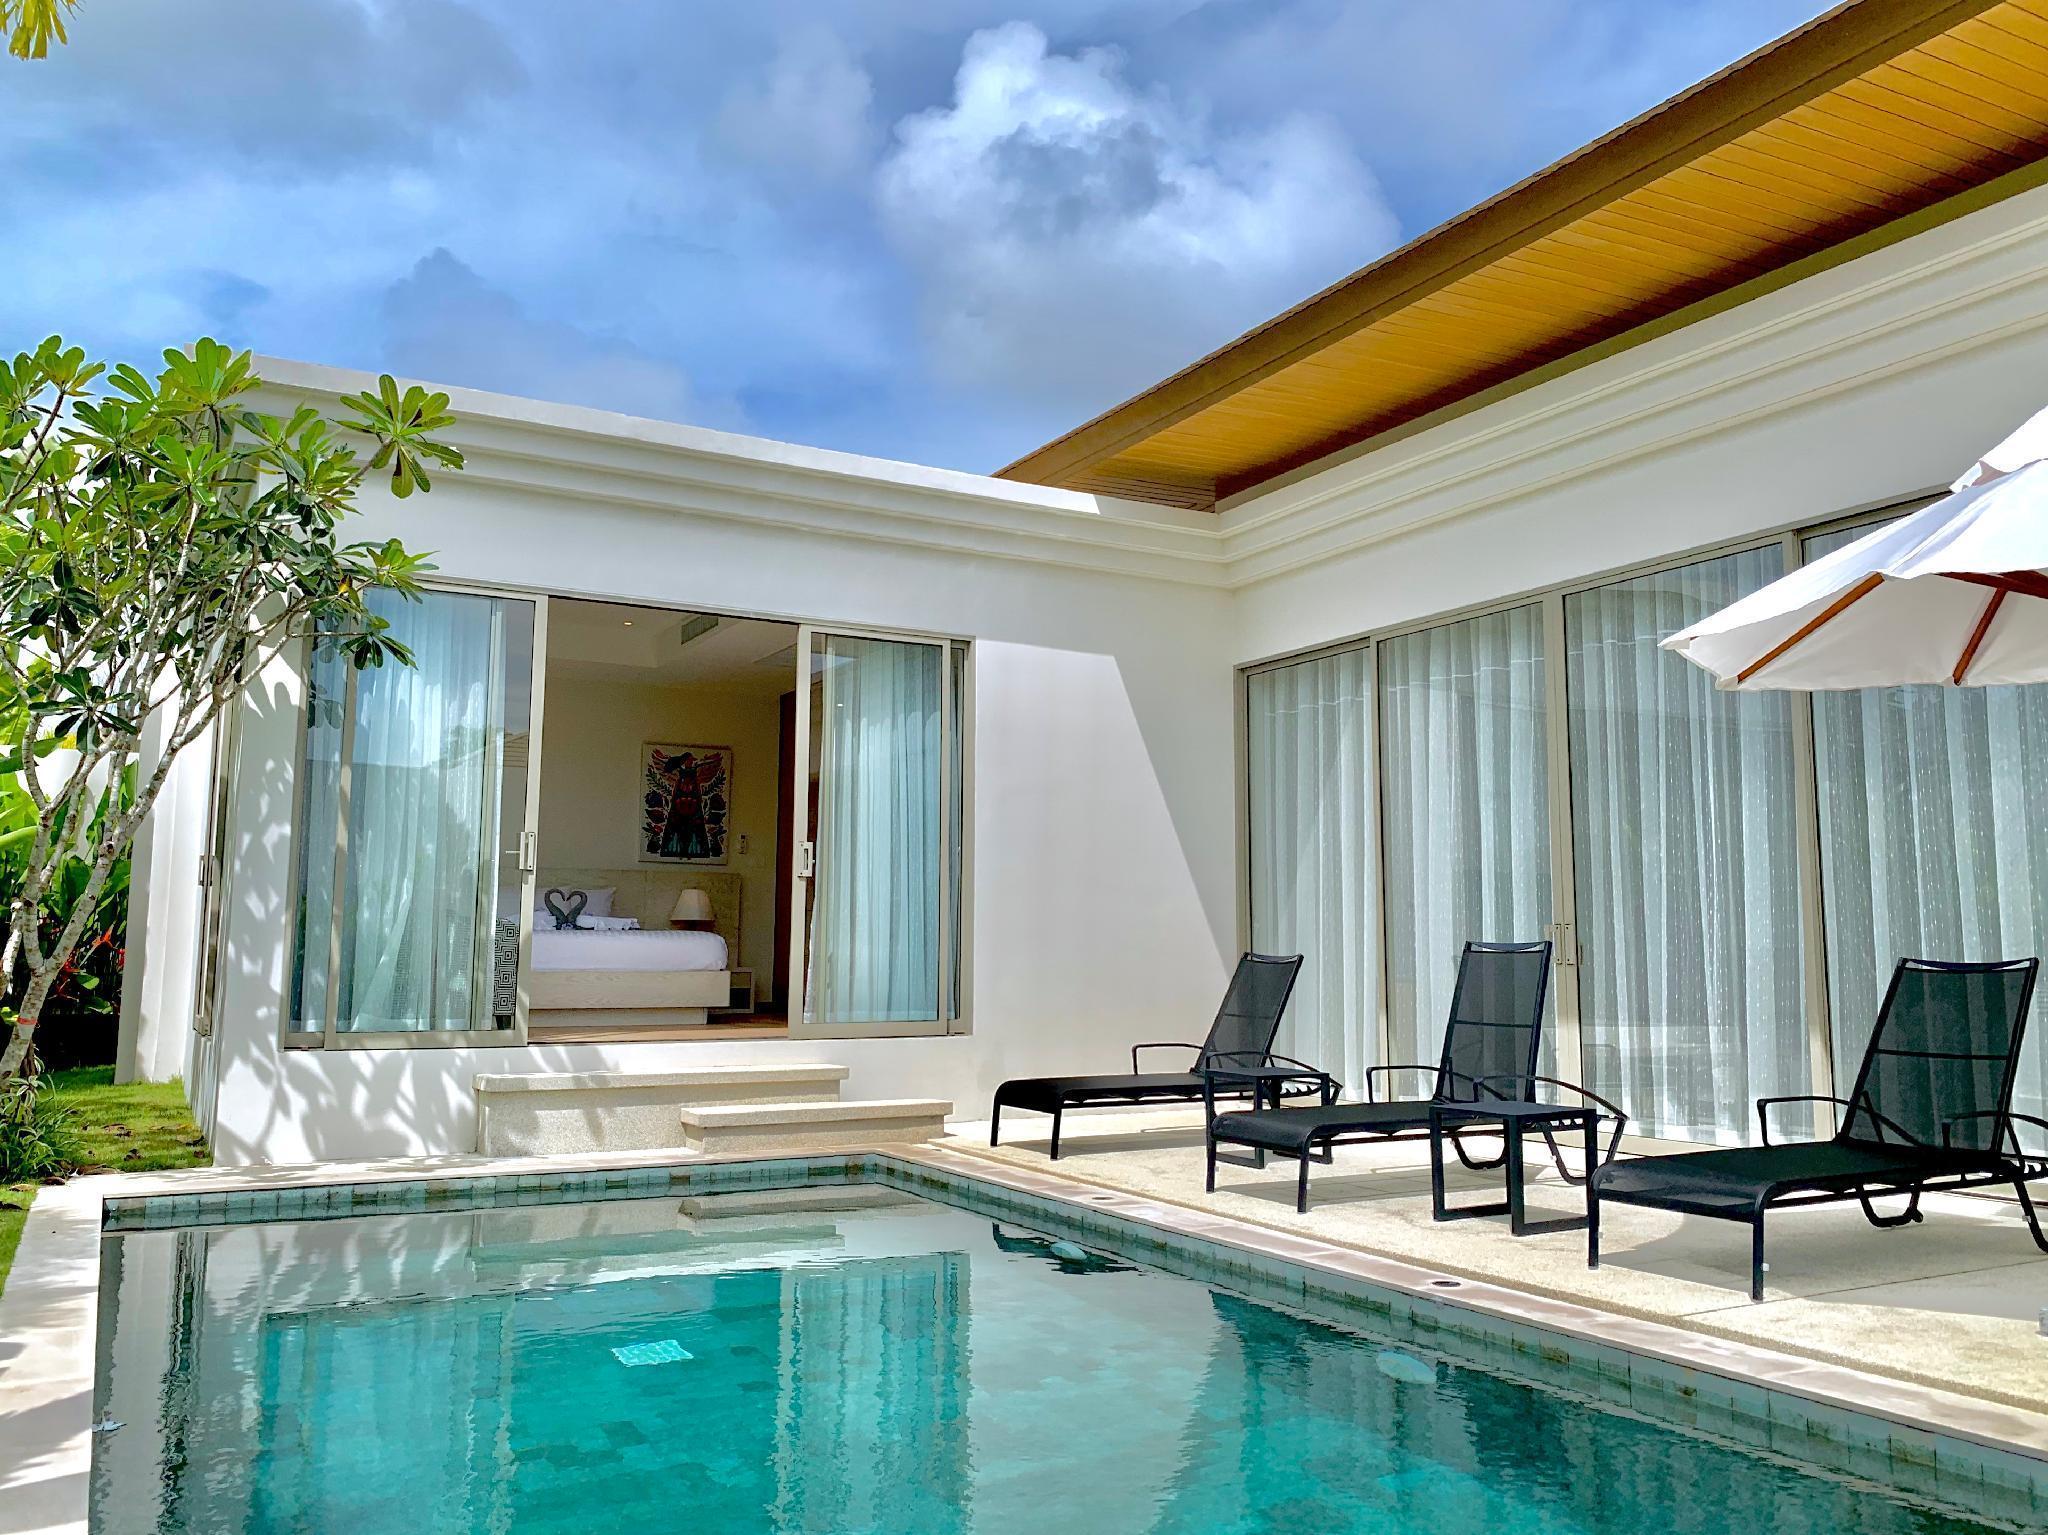 Phuket Trichada Tropical Luxury villa - TAE 8 วิลลา 3 ห้องนอน 3 ห้องน้ำส่วนตัว ขนาด 280 ตร.ม. – บางเทา